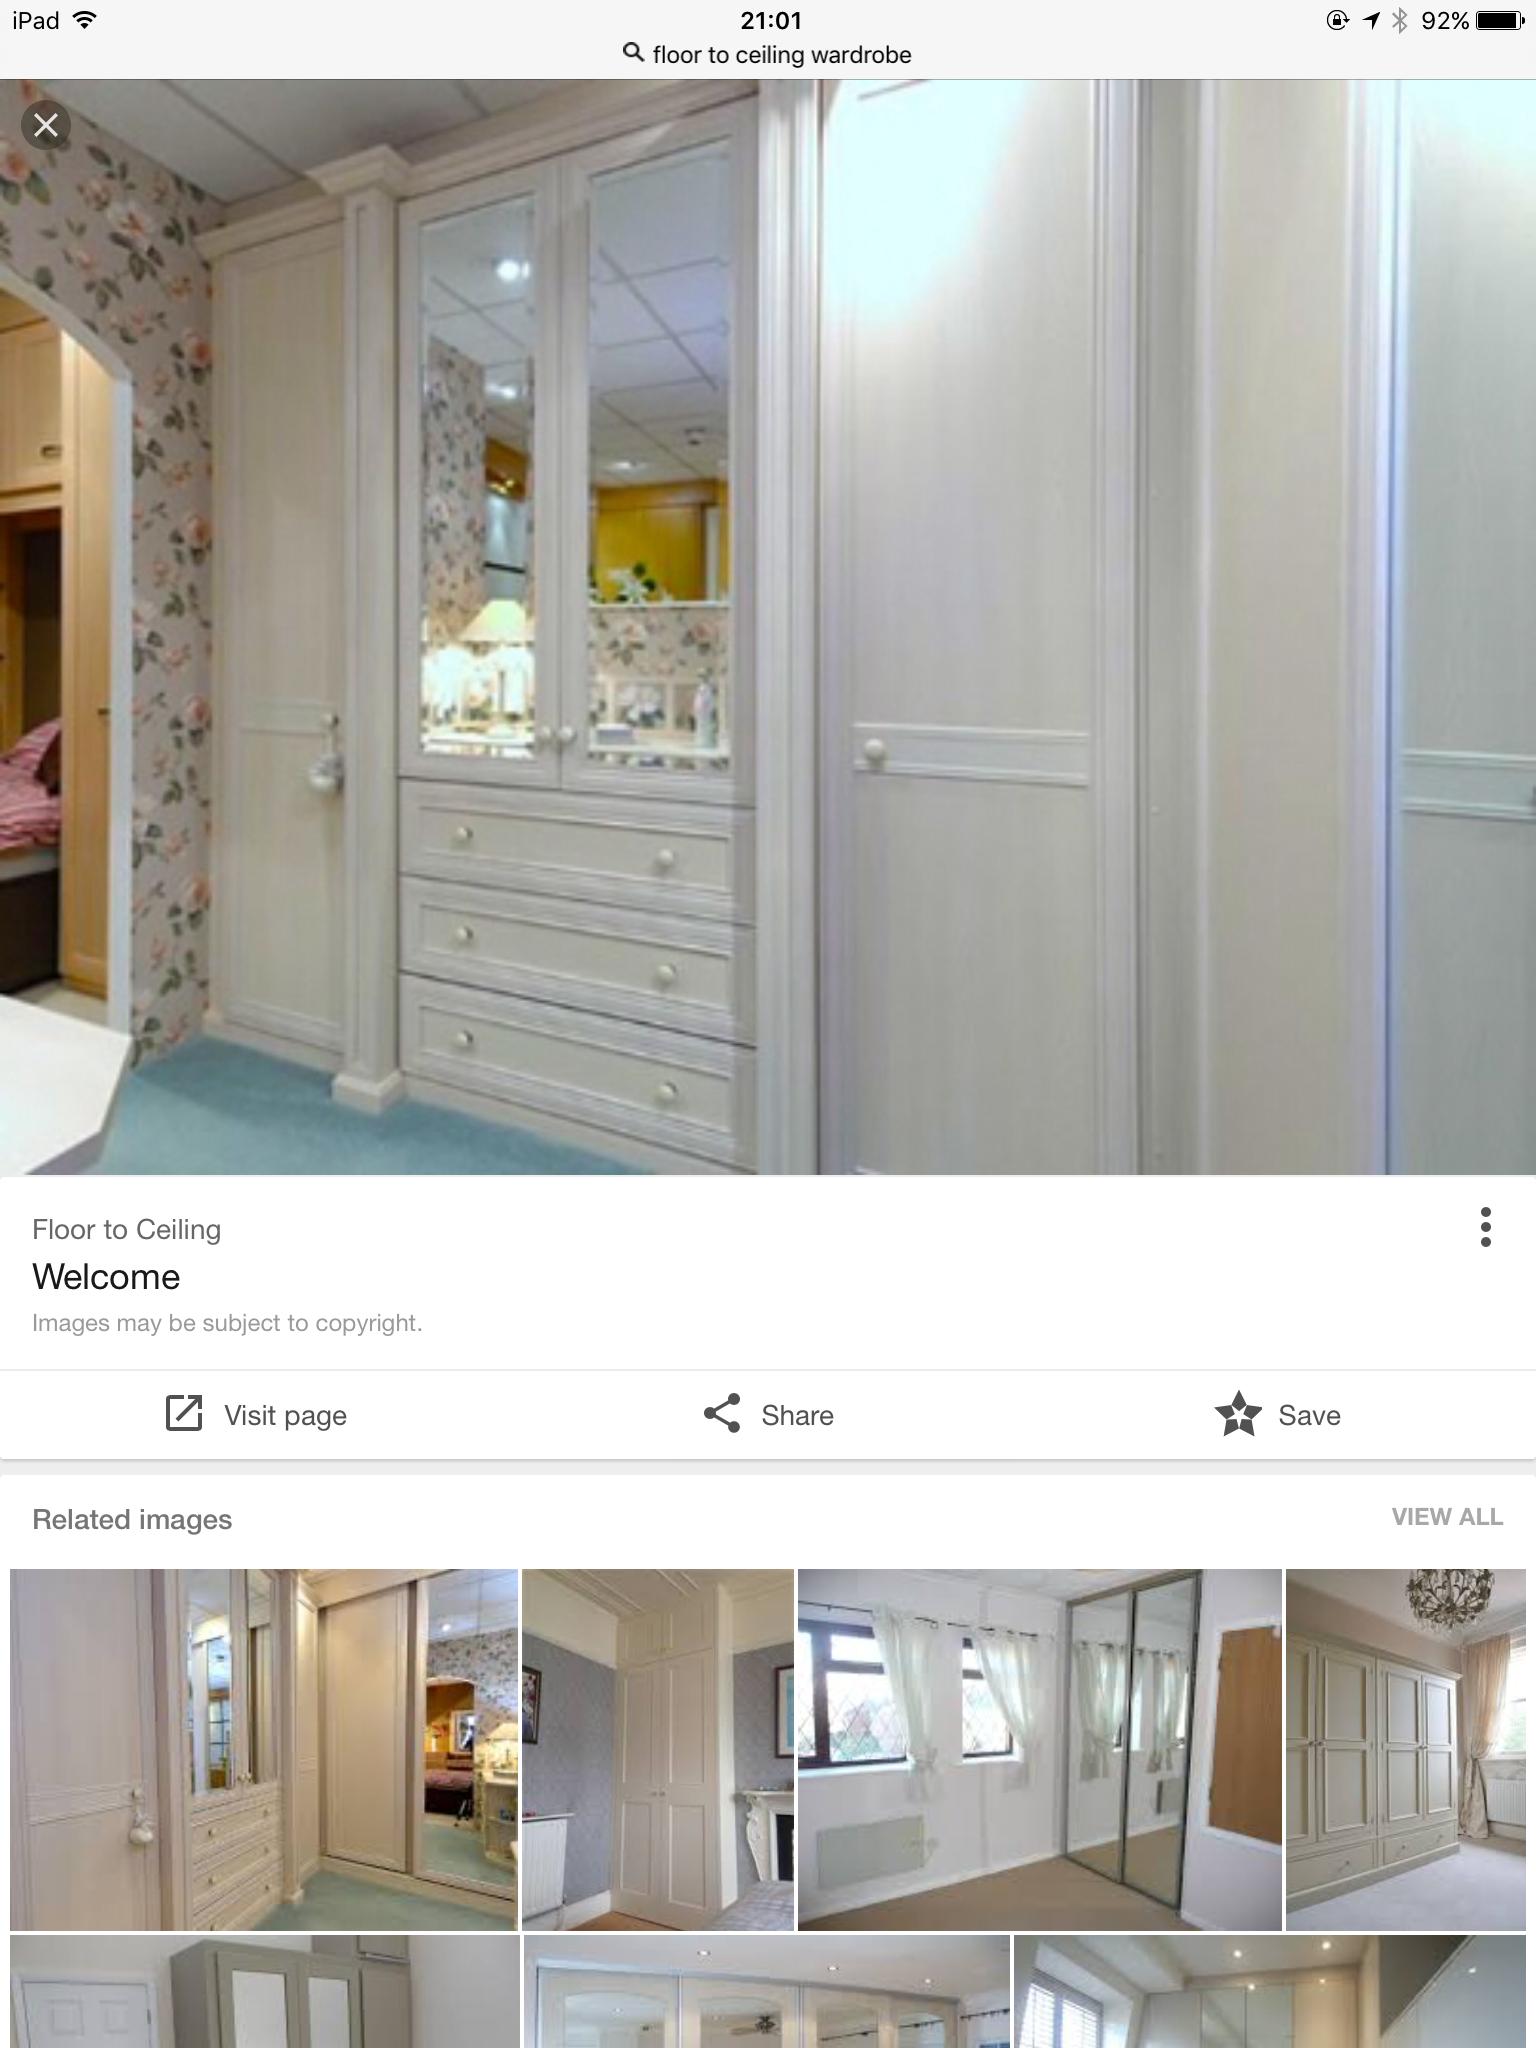 5 x 4 badezimmerdesigns pin by sarah alexander on bedroom  pinterest  bedrooms